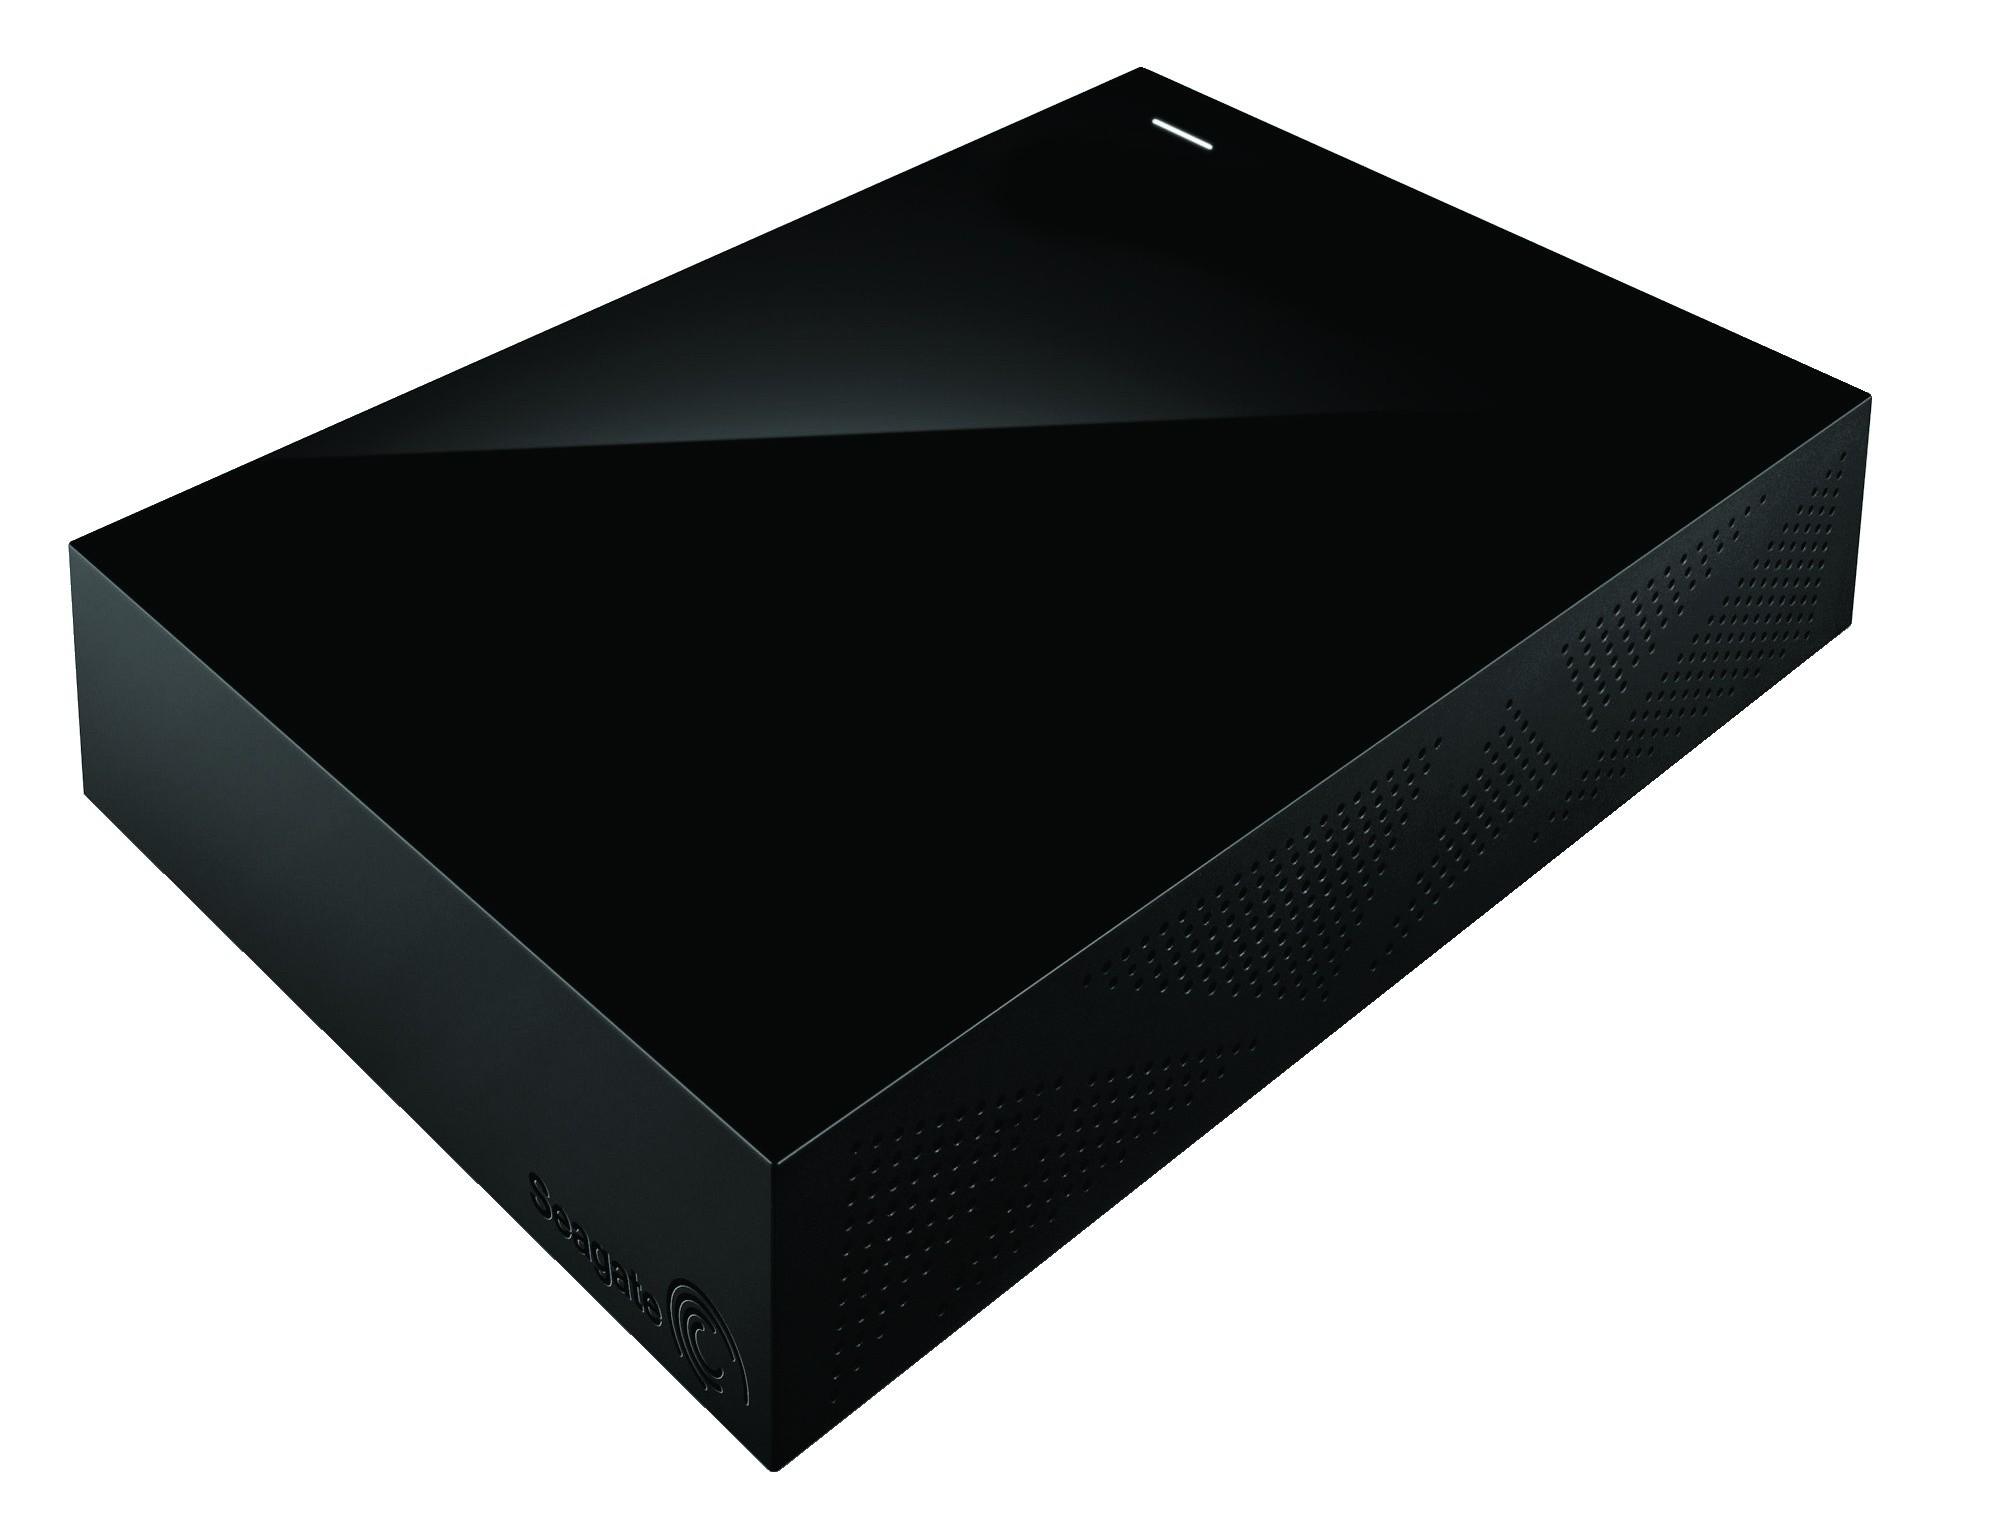 Seagate 3tb backup plus external hard drive usb3 0 ebay for 3tb esterno